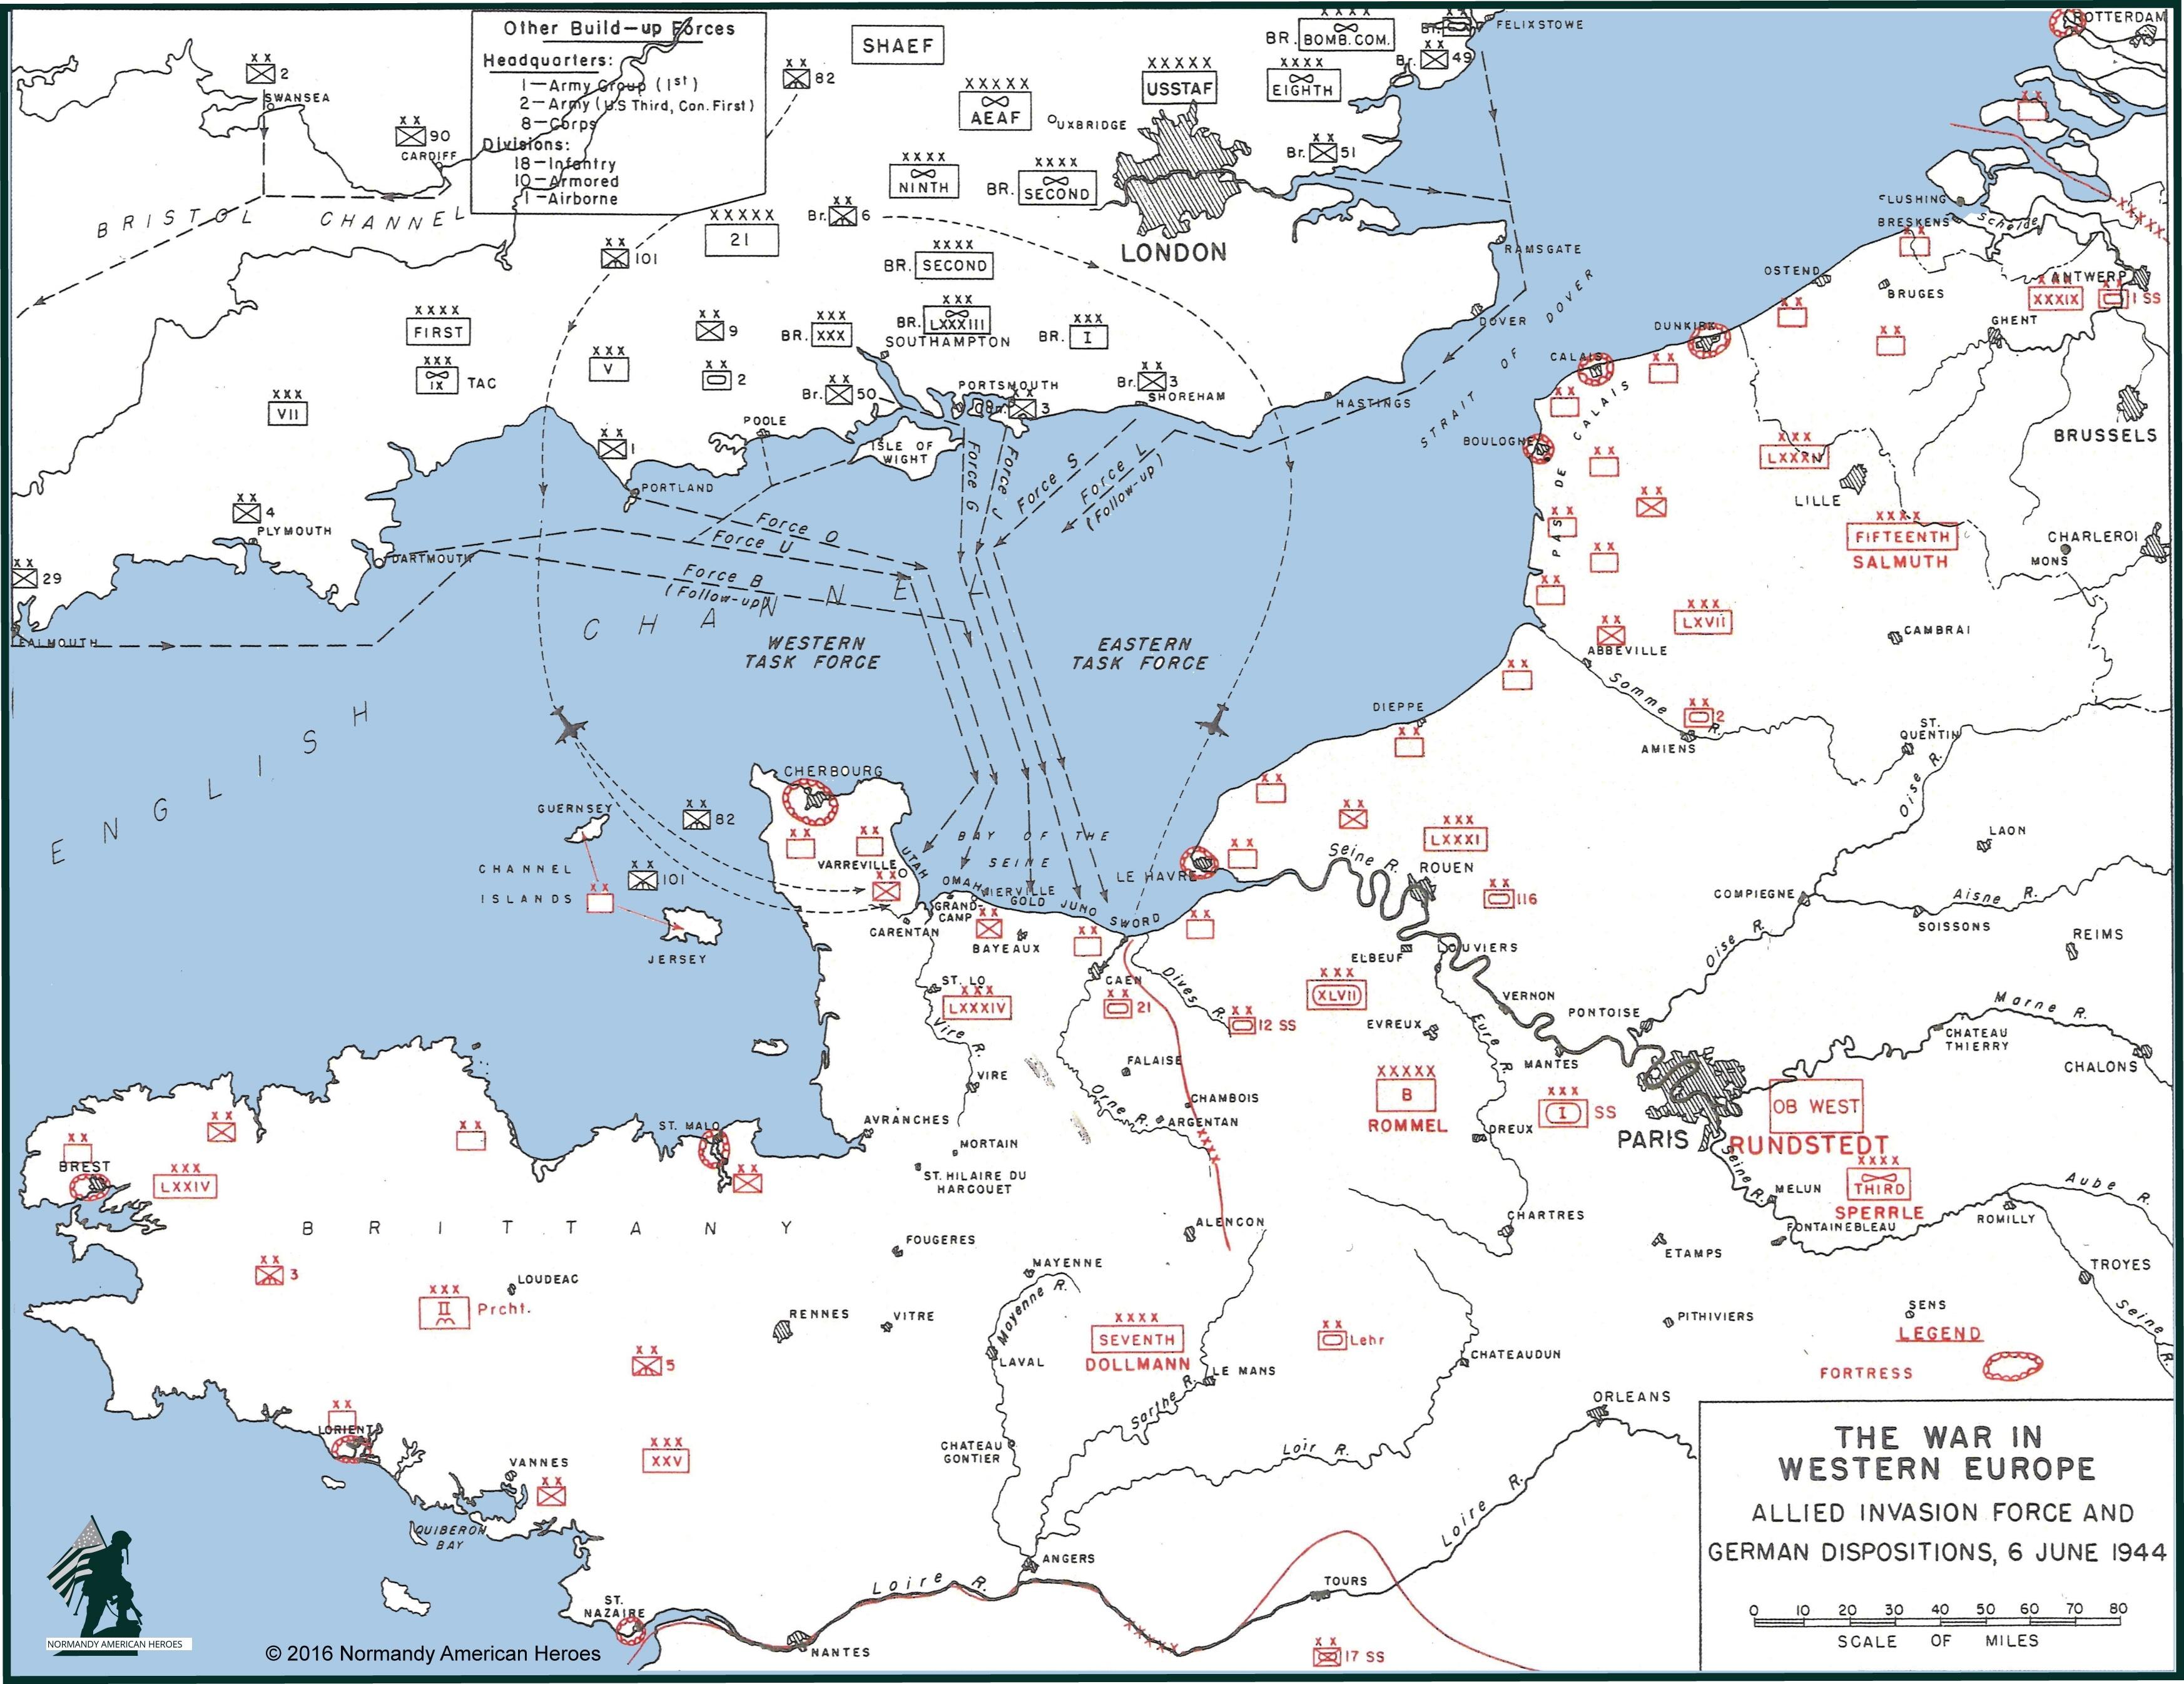 German dispositions 6 June 1944.jpg